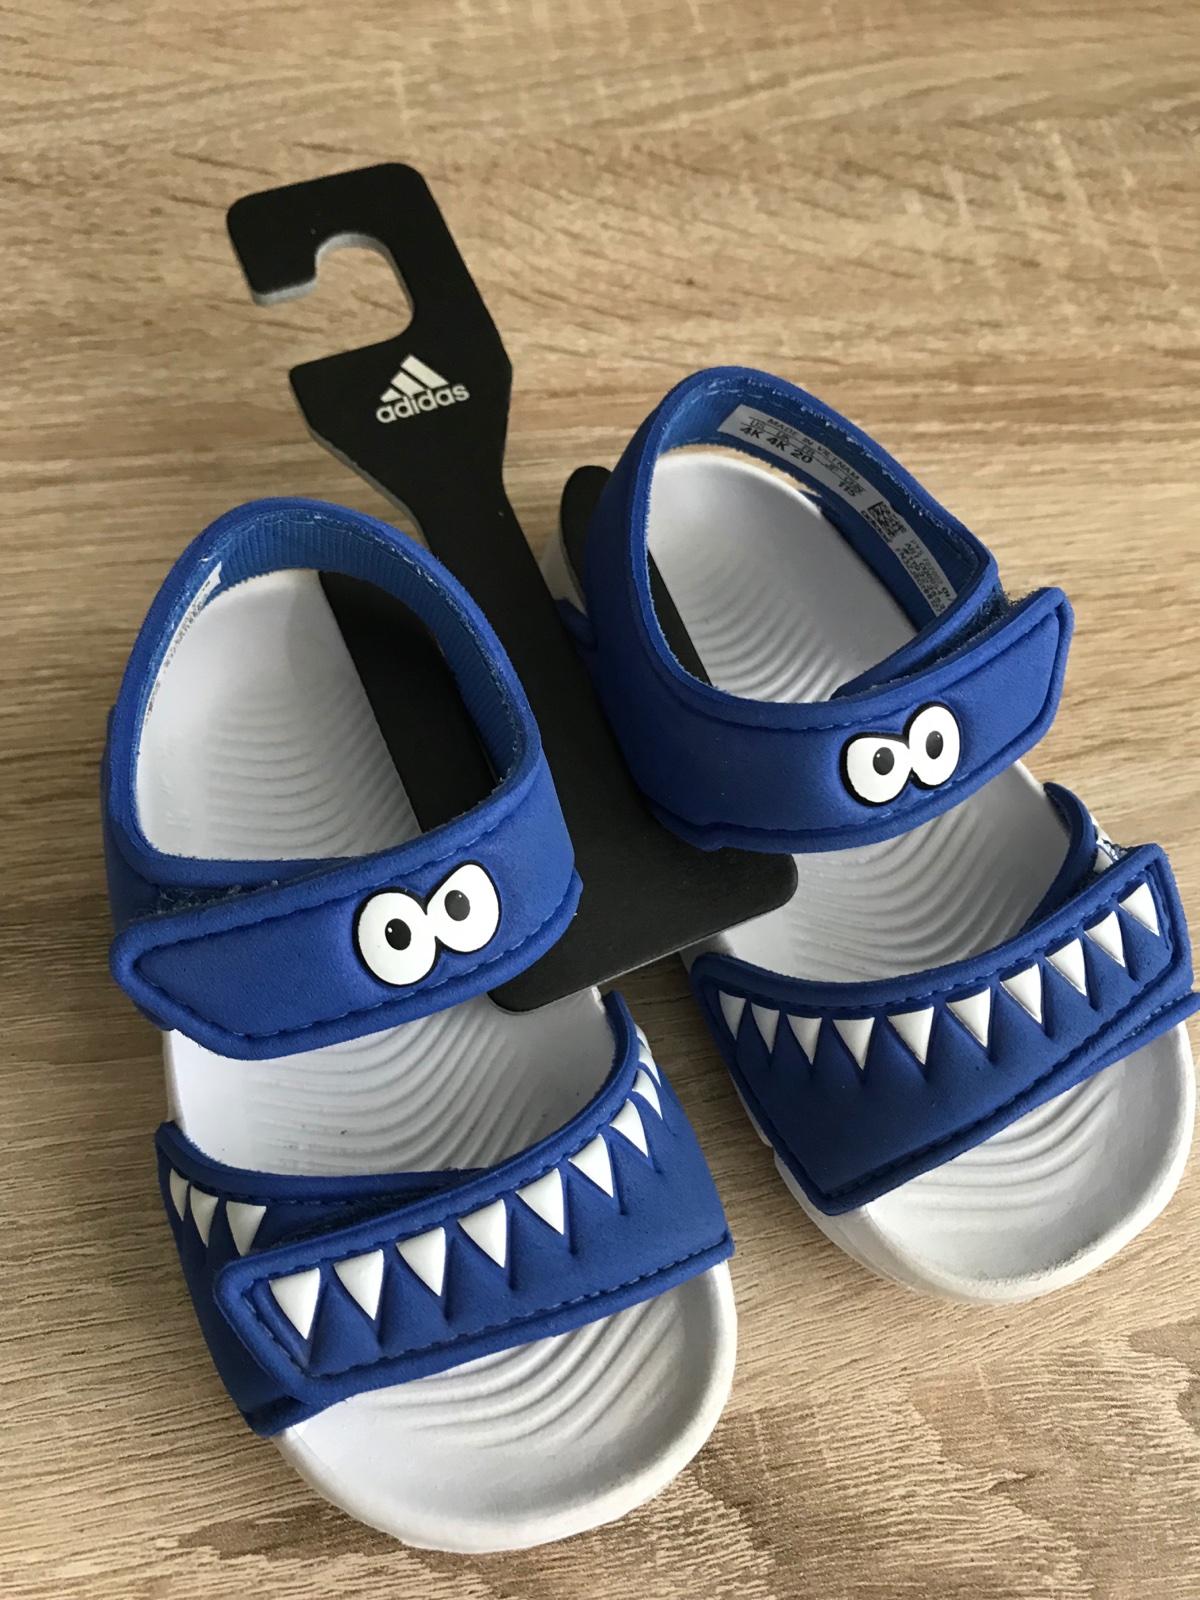 decccf3b00d2 27 inzerátov • 33 hodnotení. Chlapčenské sandále adidas ...